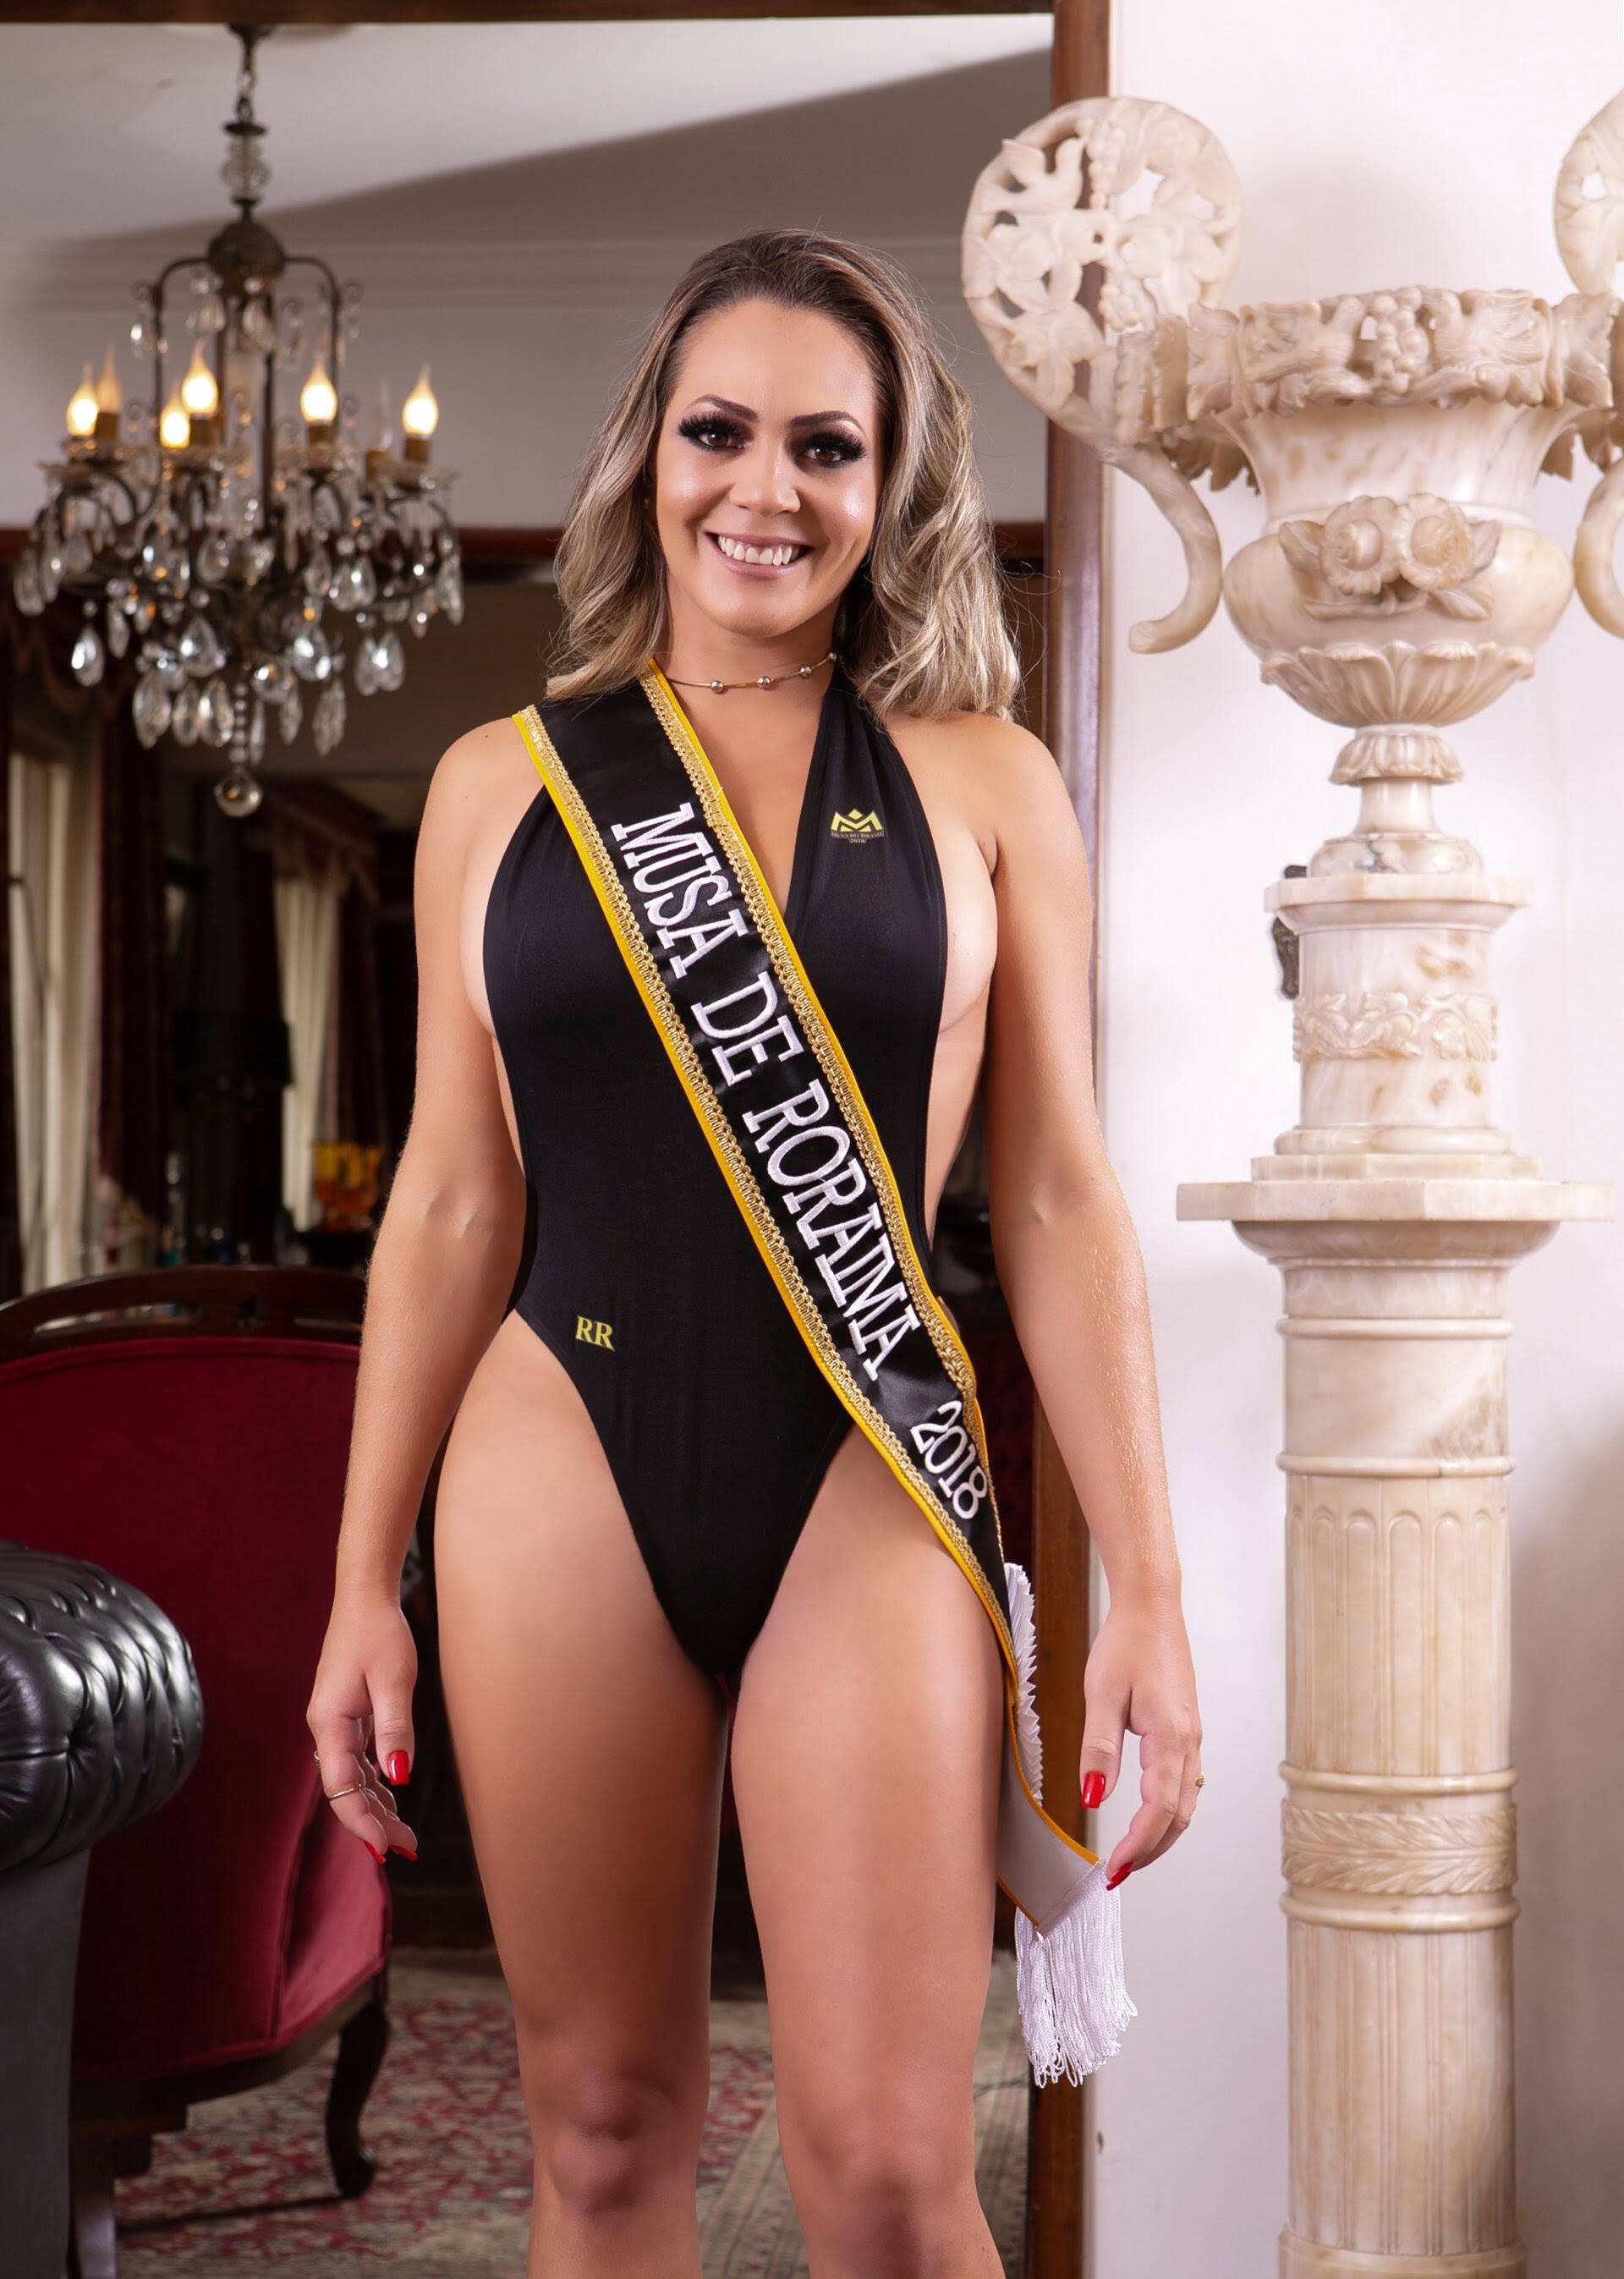 Candidata do Musa do Brasil. Foto: Daniel Cespedes / M2 Mídia